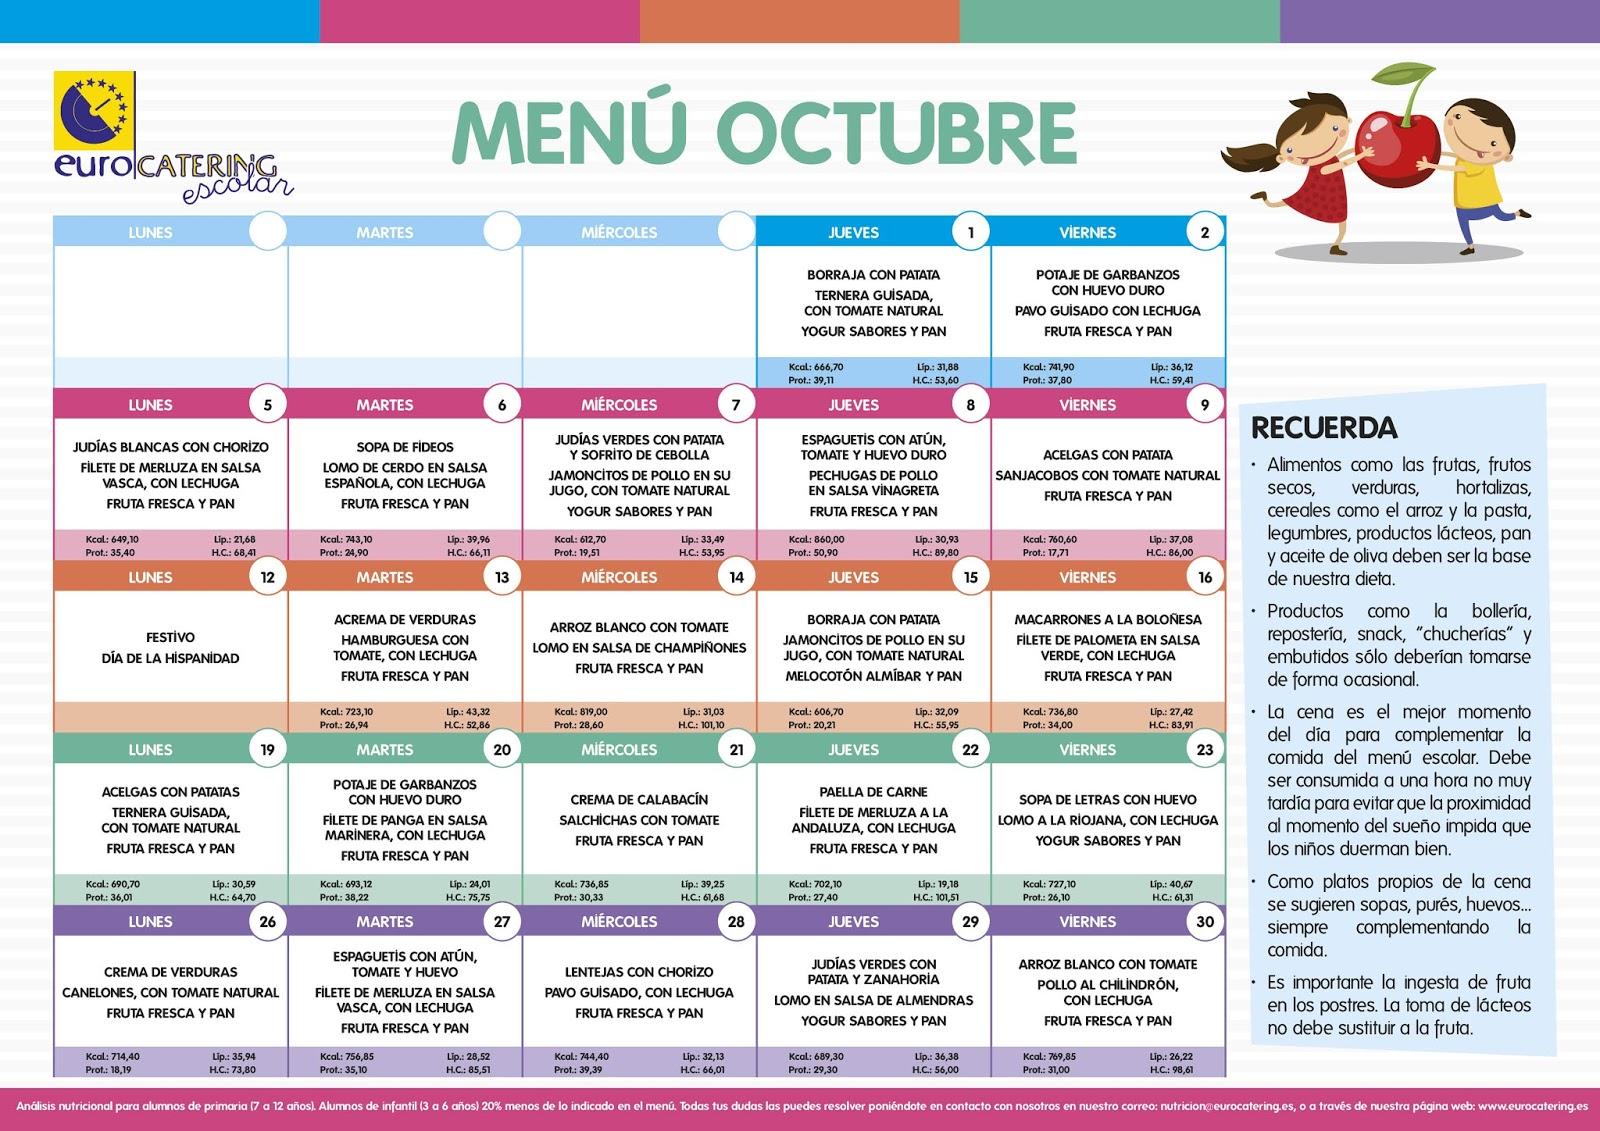 Menu octubre for Plan de comedor escolar